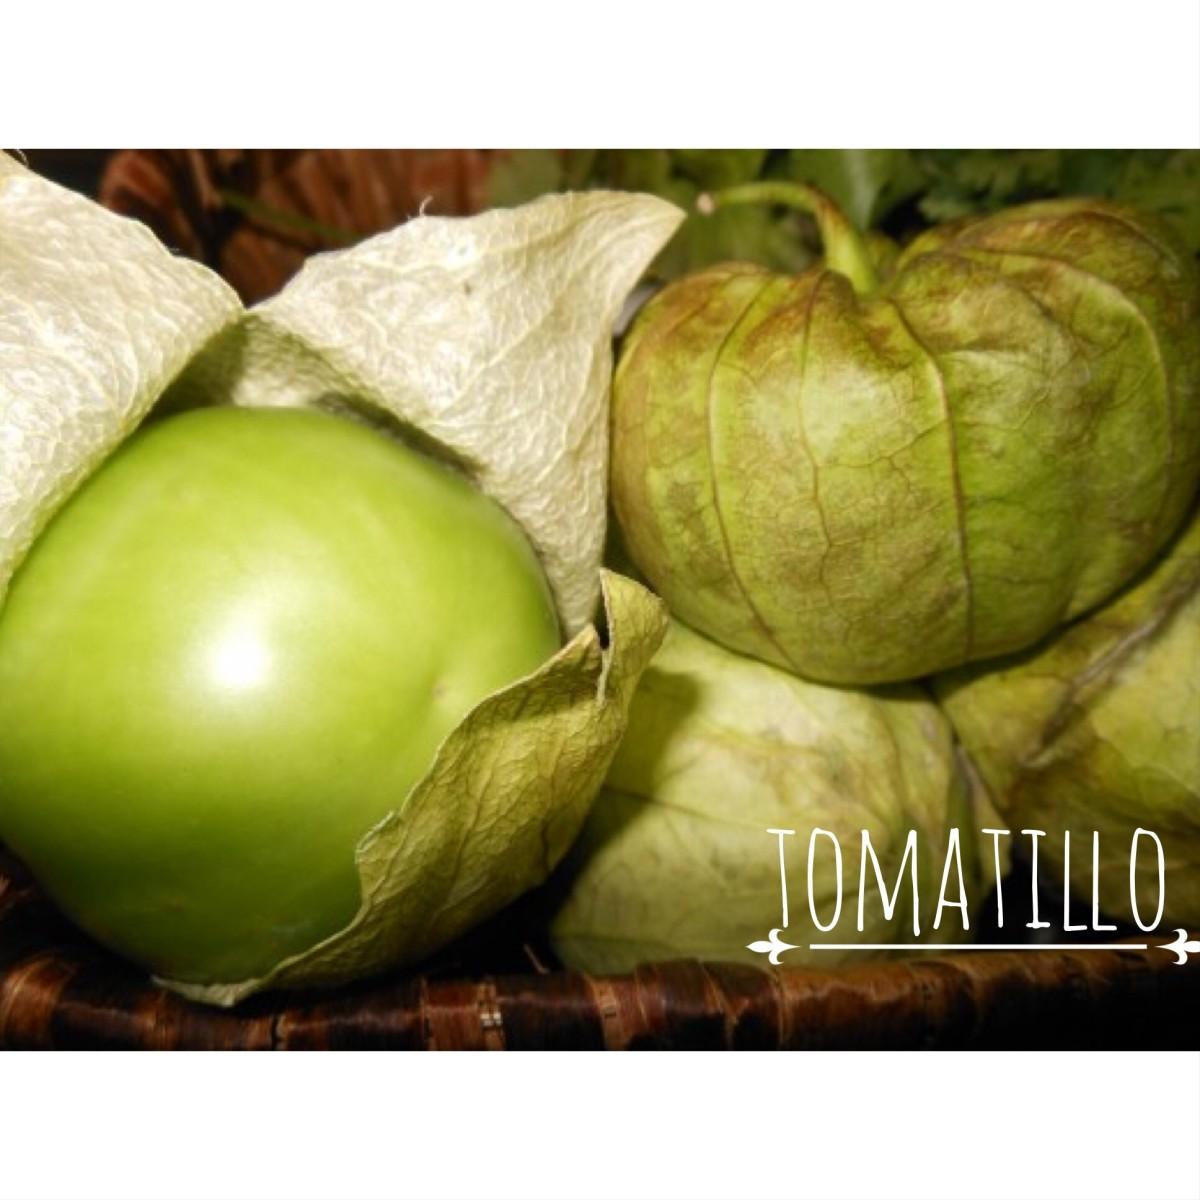 The tomatillo (toe-ma-tea-o) originally comes from Mexico